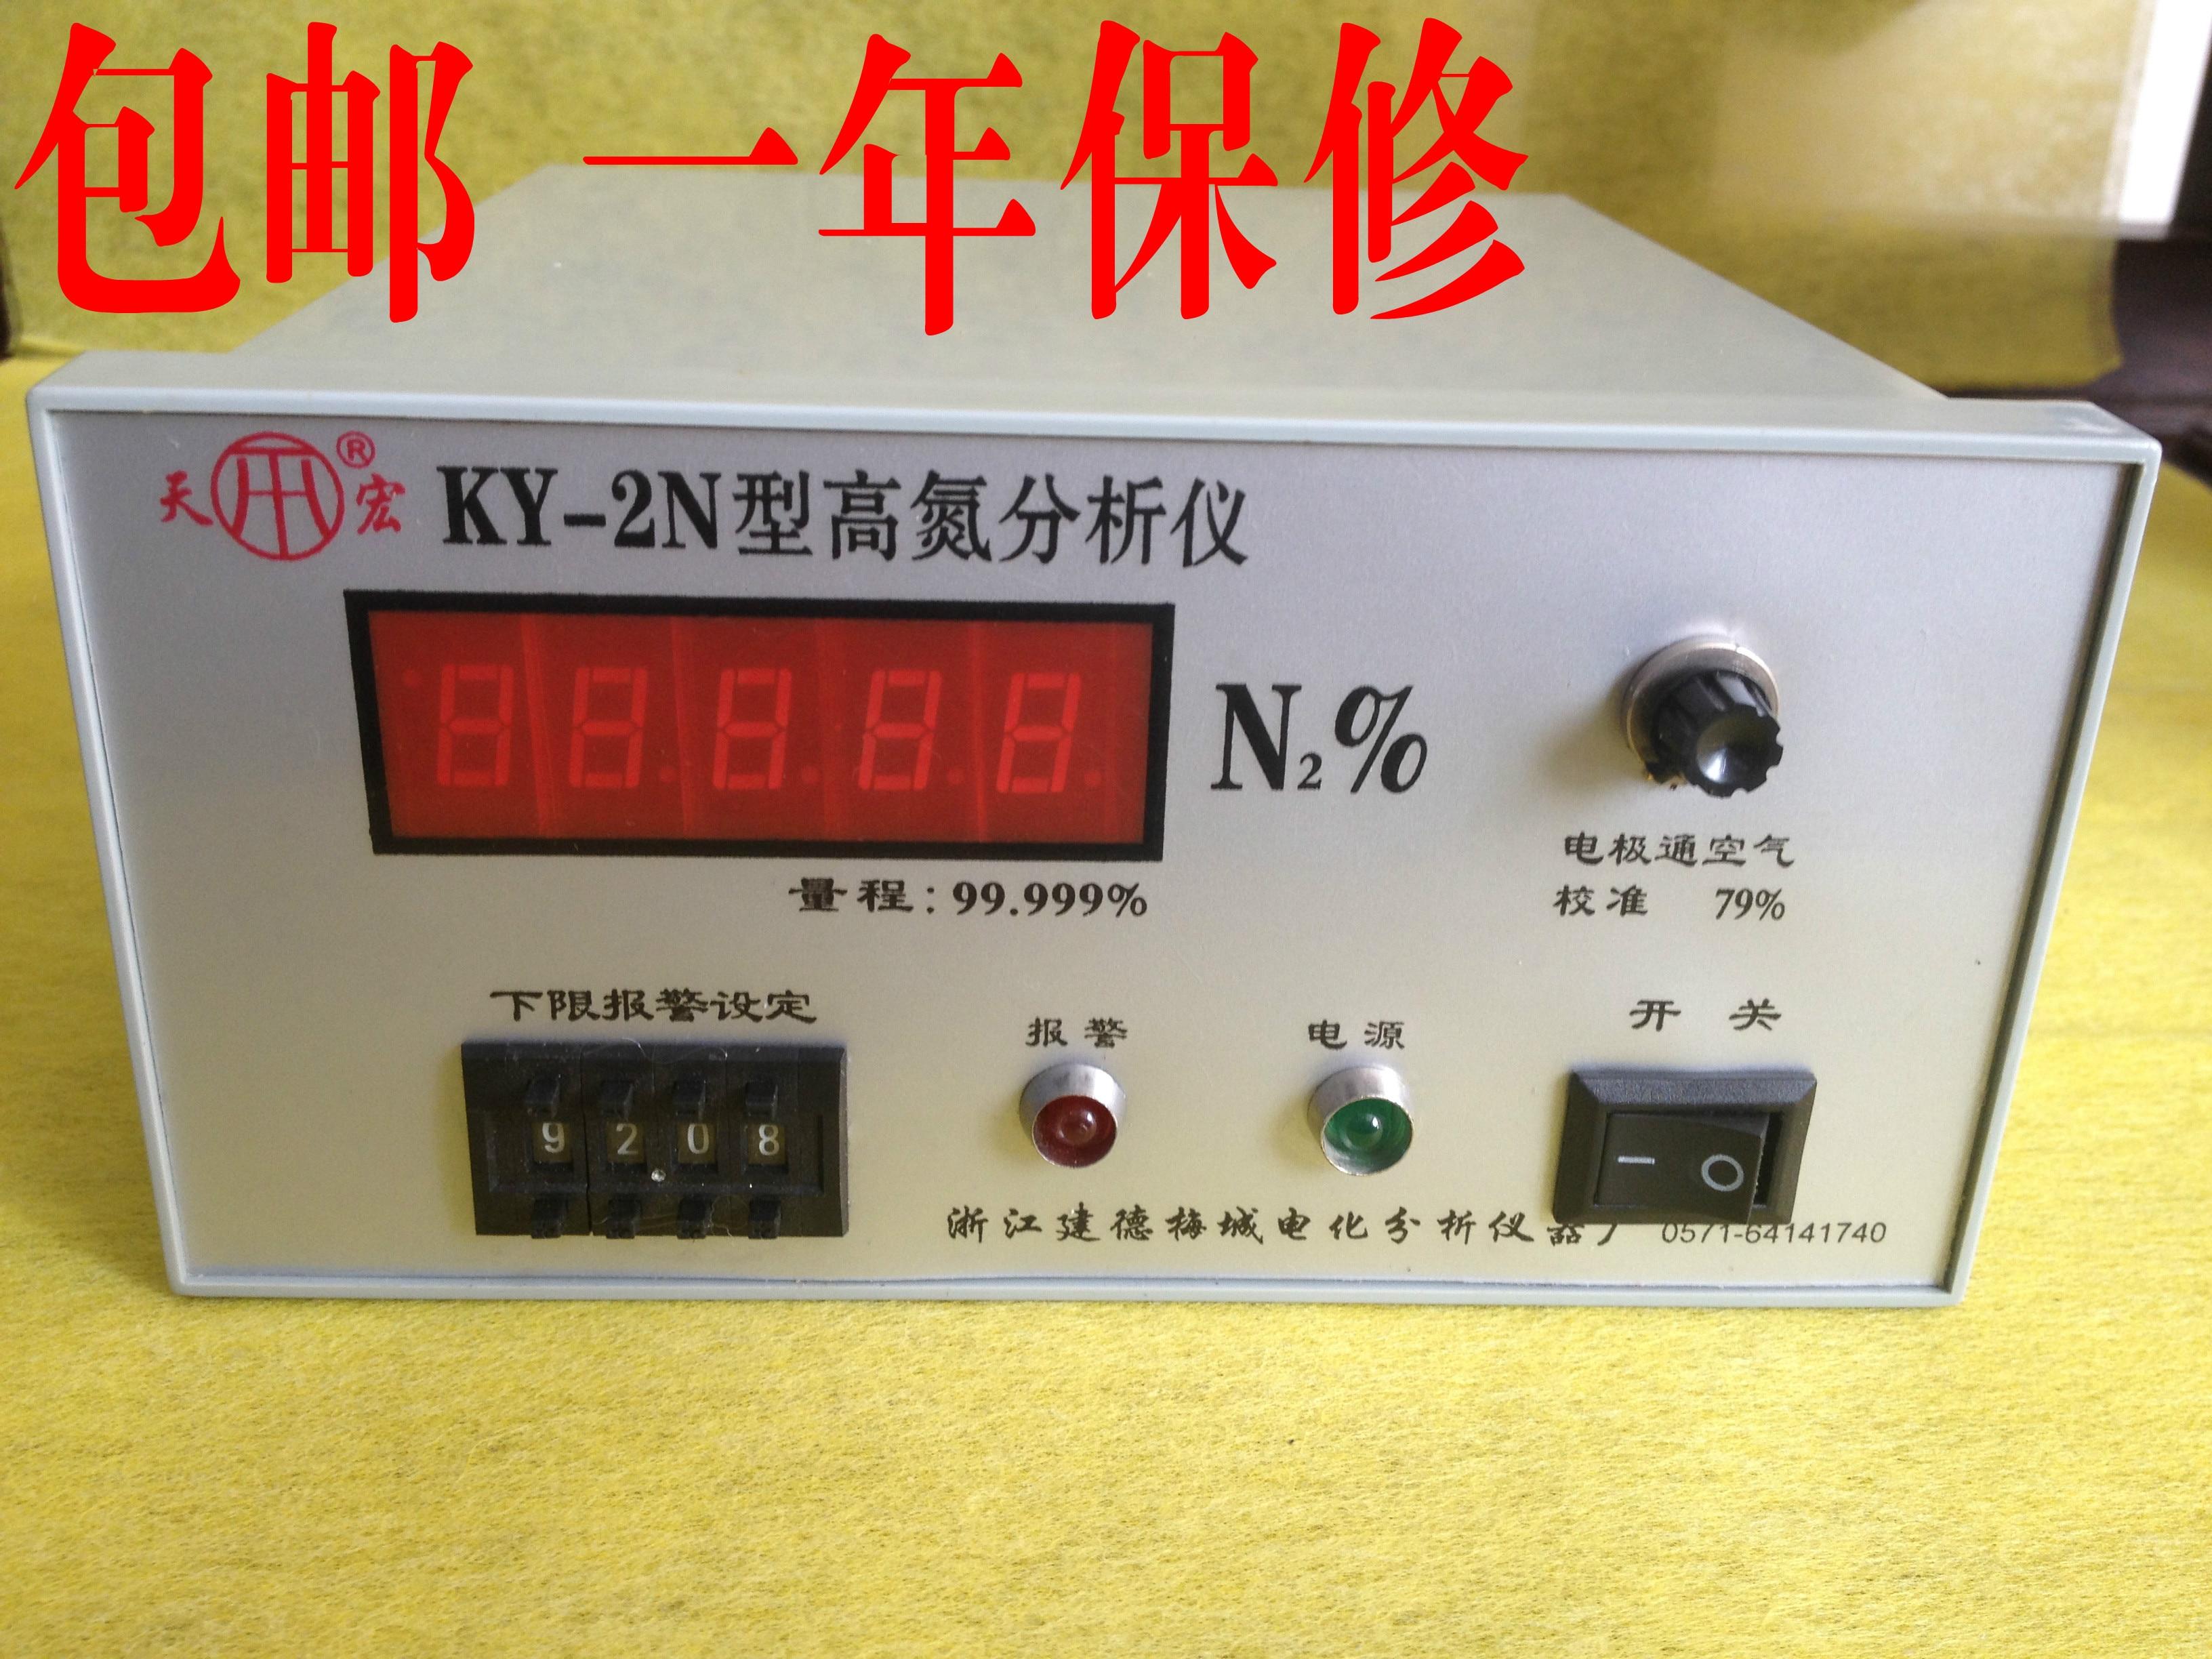 Make For Ky-2n Nitrogen Analyzer Nitrogen Analyzer 99.999 99.99 Manufacturer's Genuine Product